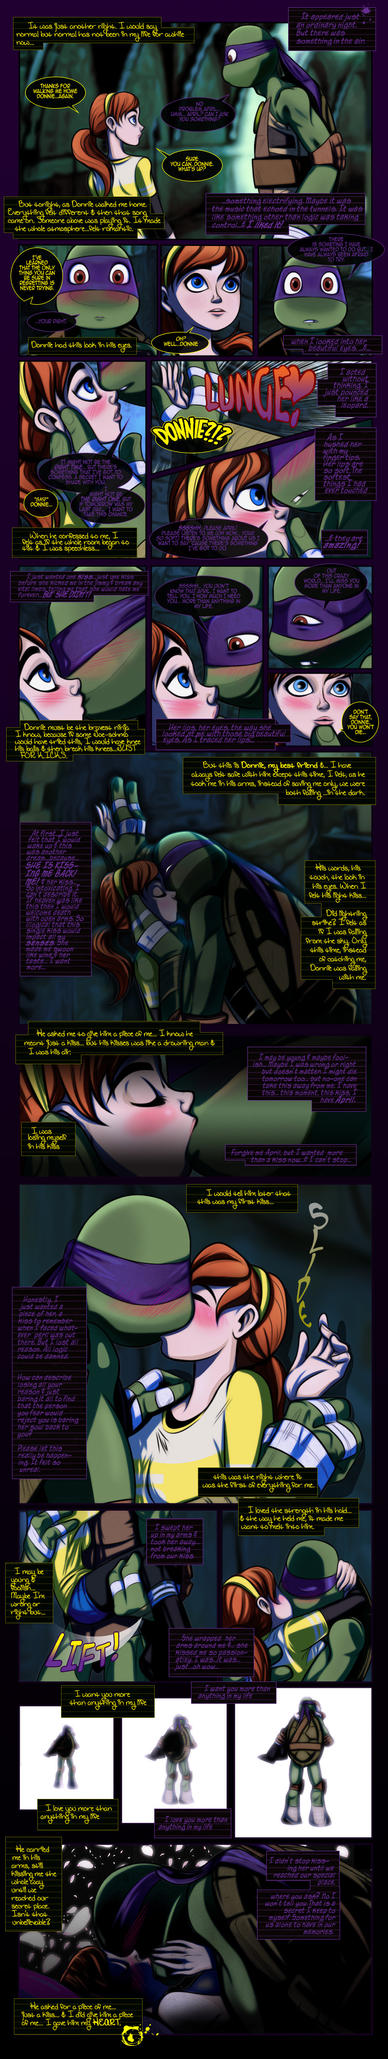 Donatello+April Fan-Comic Parachute by JasmineAlexandra